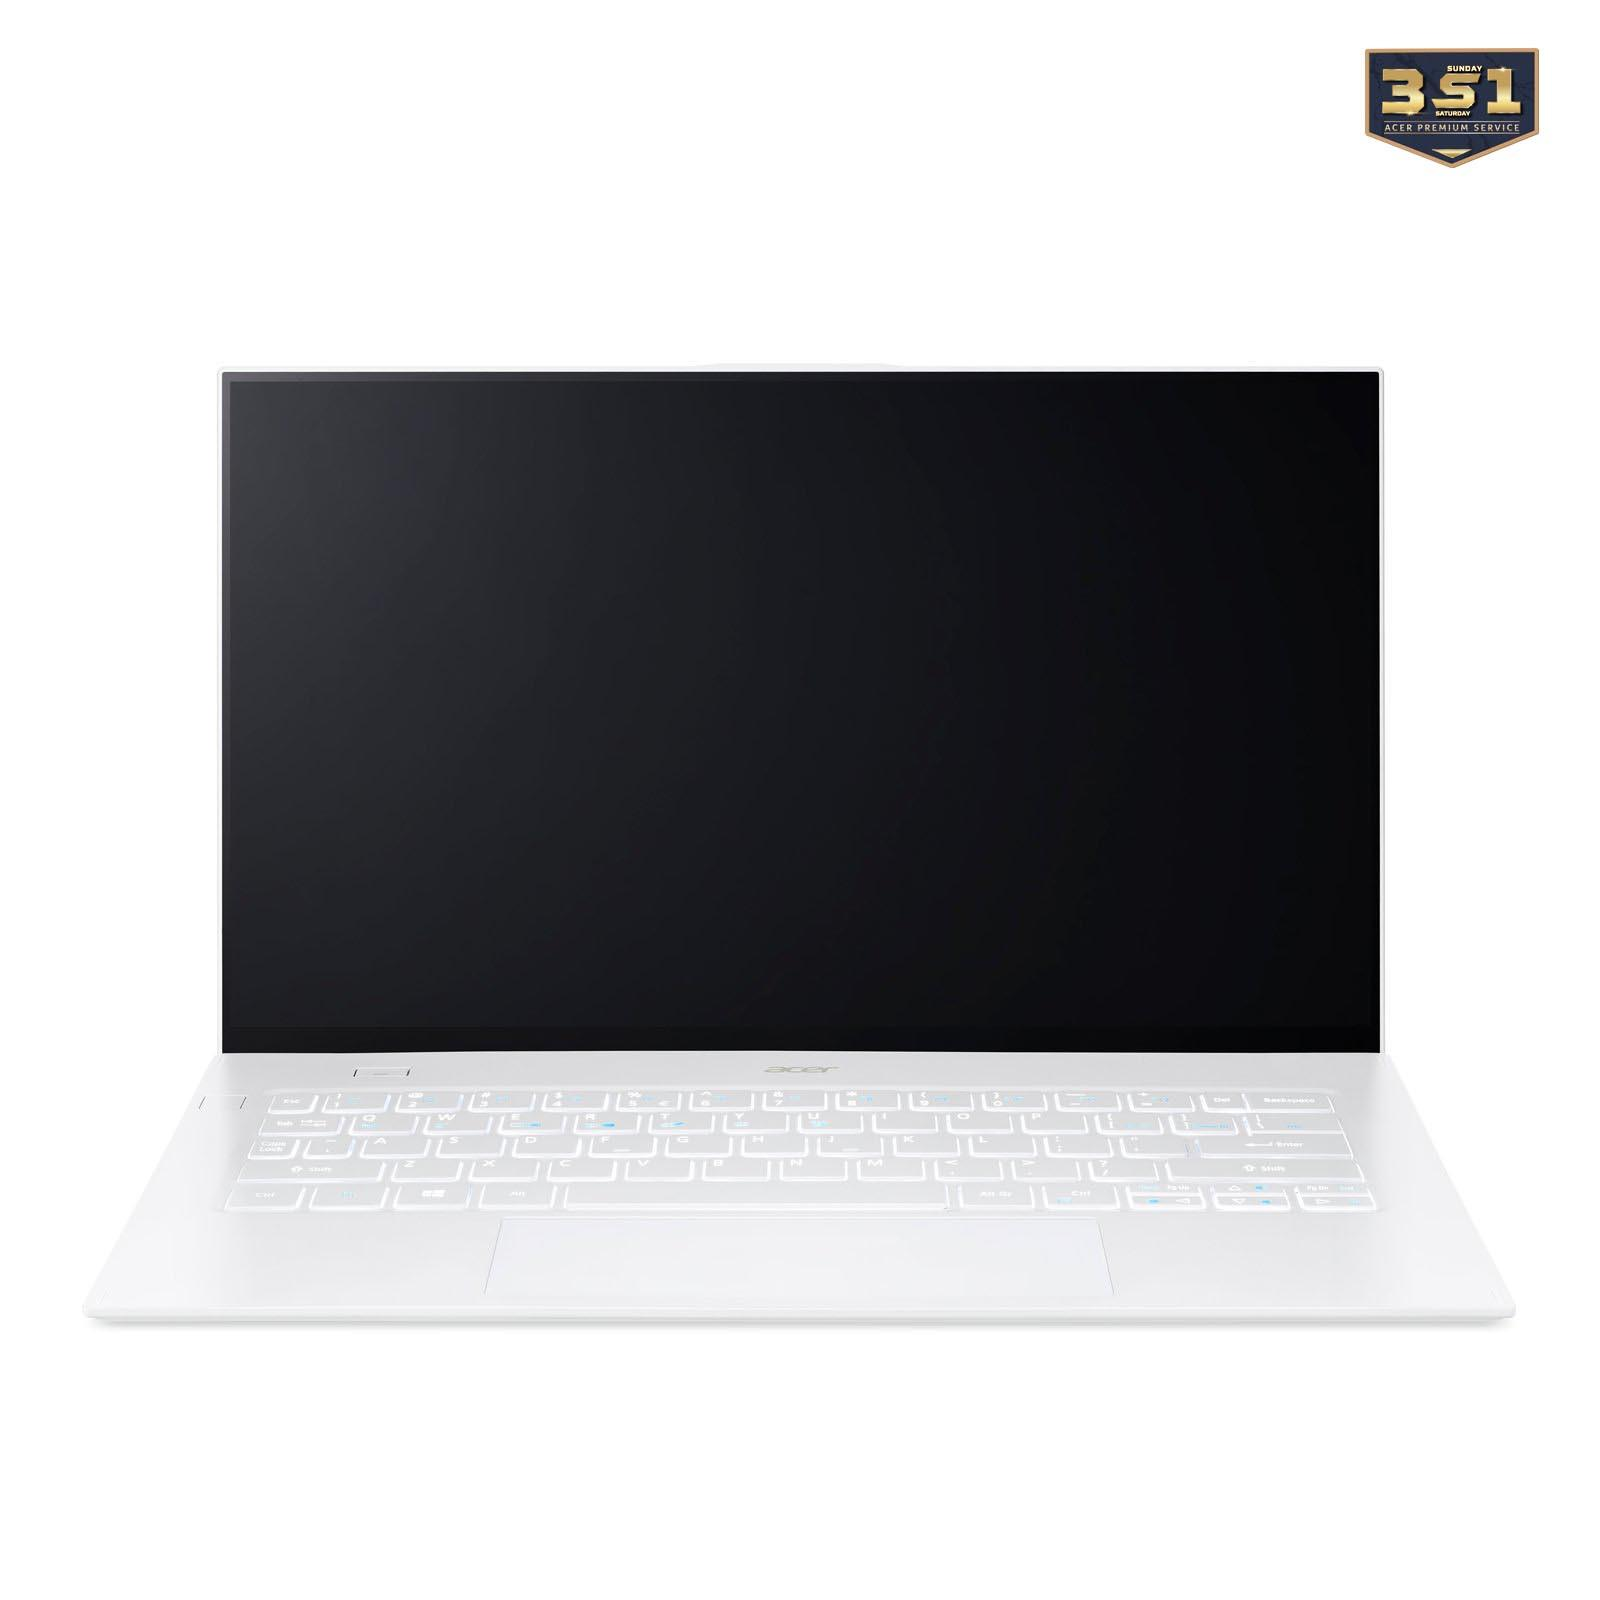 Laptop ACer Swift 7 SF714-52T-710F (i7 8500Y/16GB RAM/512GB SSD/14.0FHDT/Win10/Trắng)